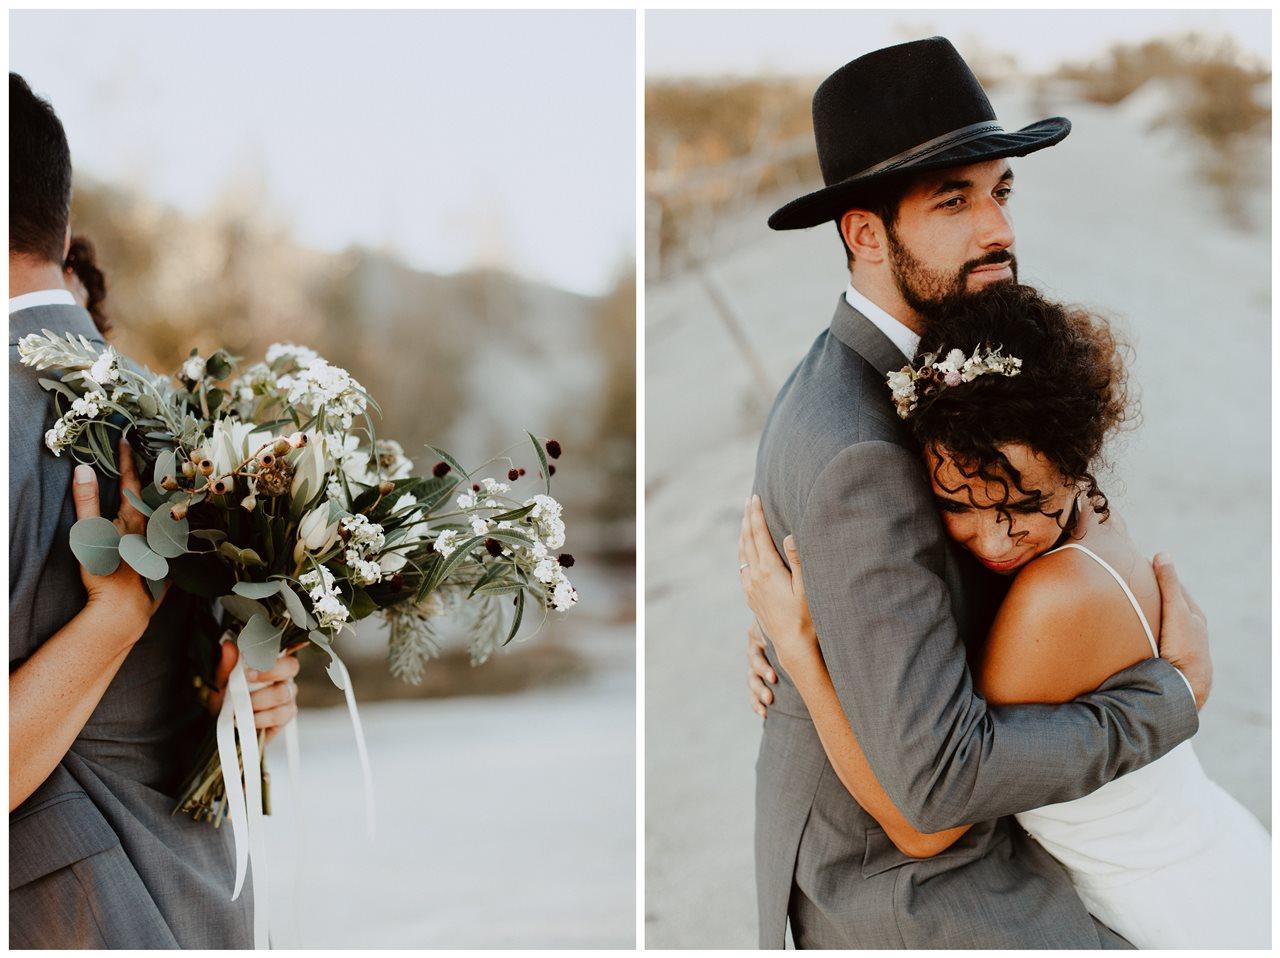 mariage nude plage portrait mariée calin fleurs mariée